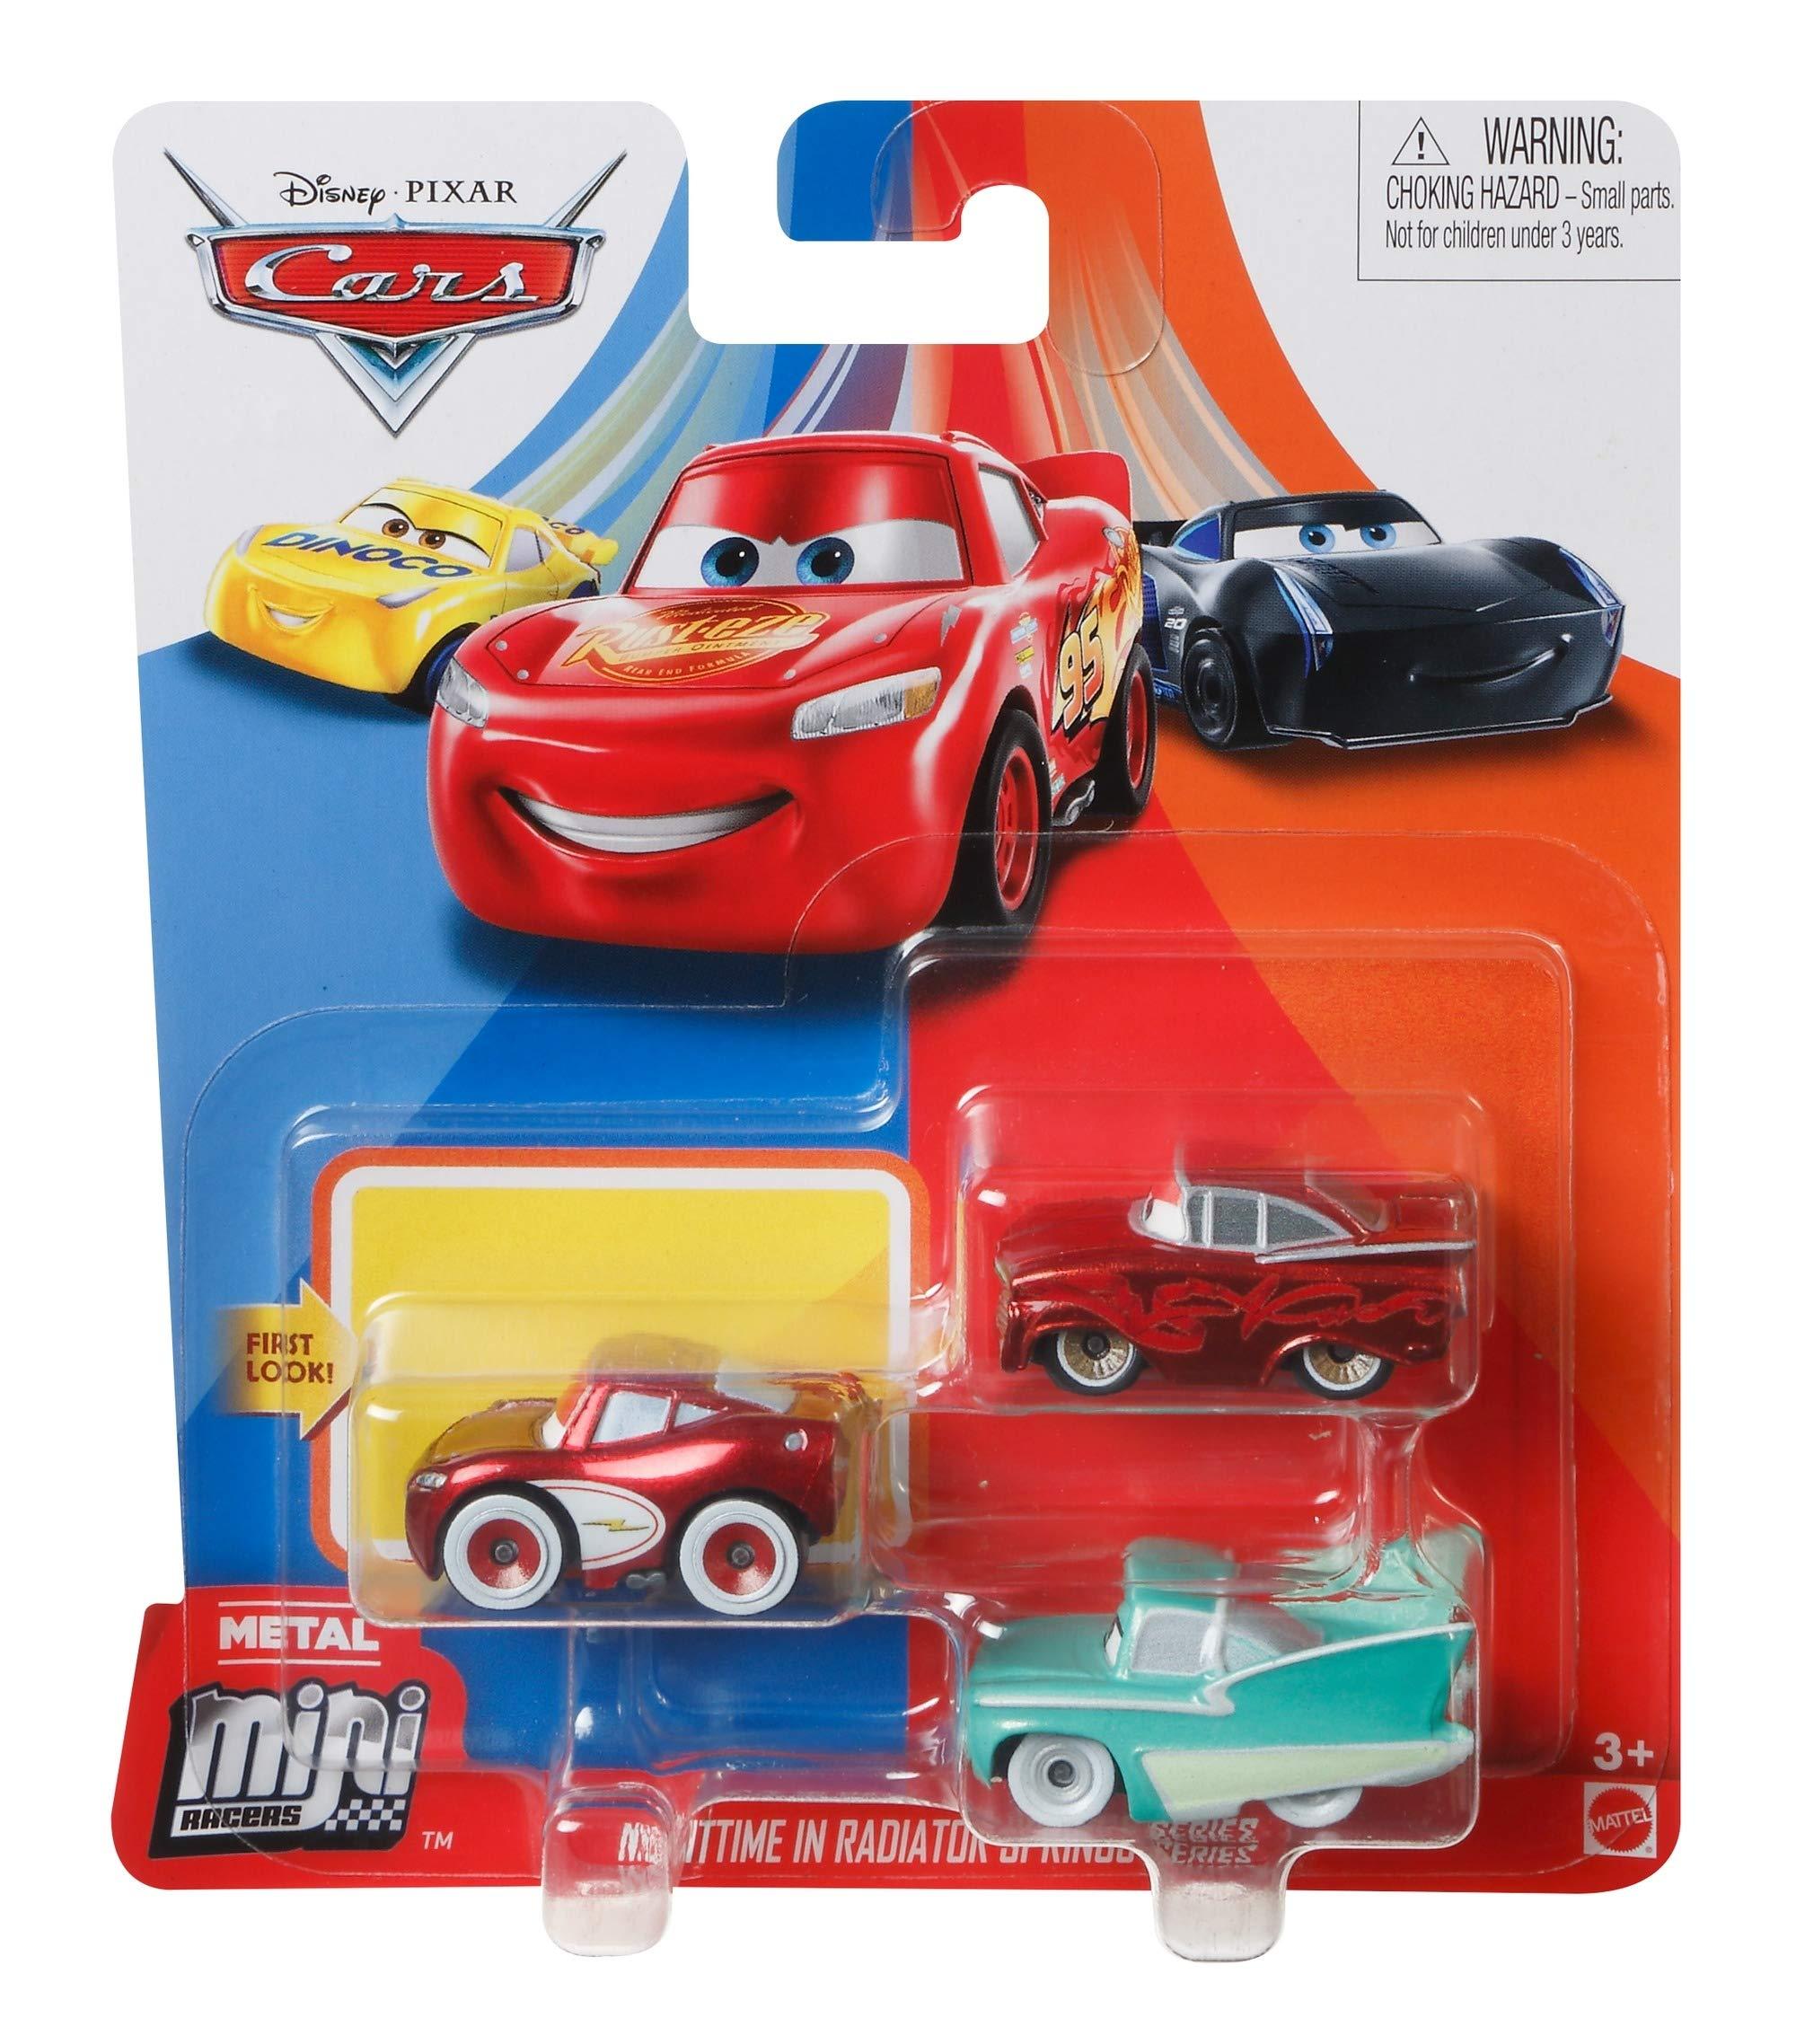 Disney Pixar Cars - Mini Racers 3 Pack - FLO, Red Ramone and Cruisin Lightning Mcqueen: Amazon.es: Juguetes y juegos